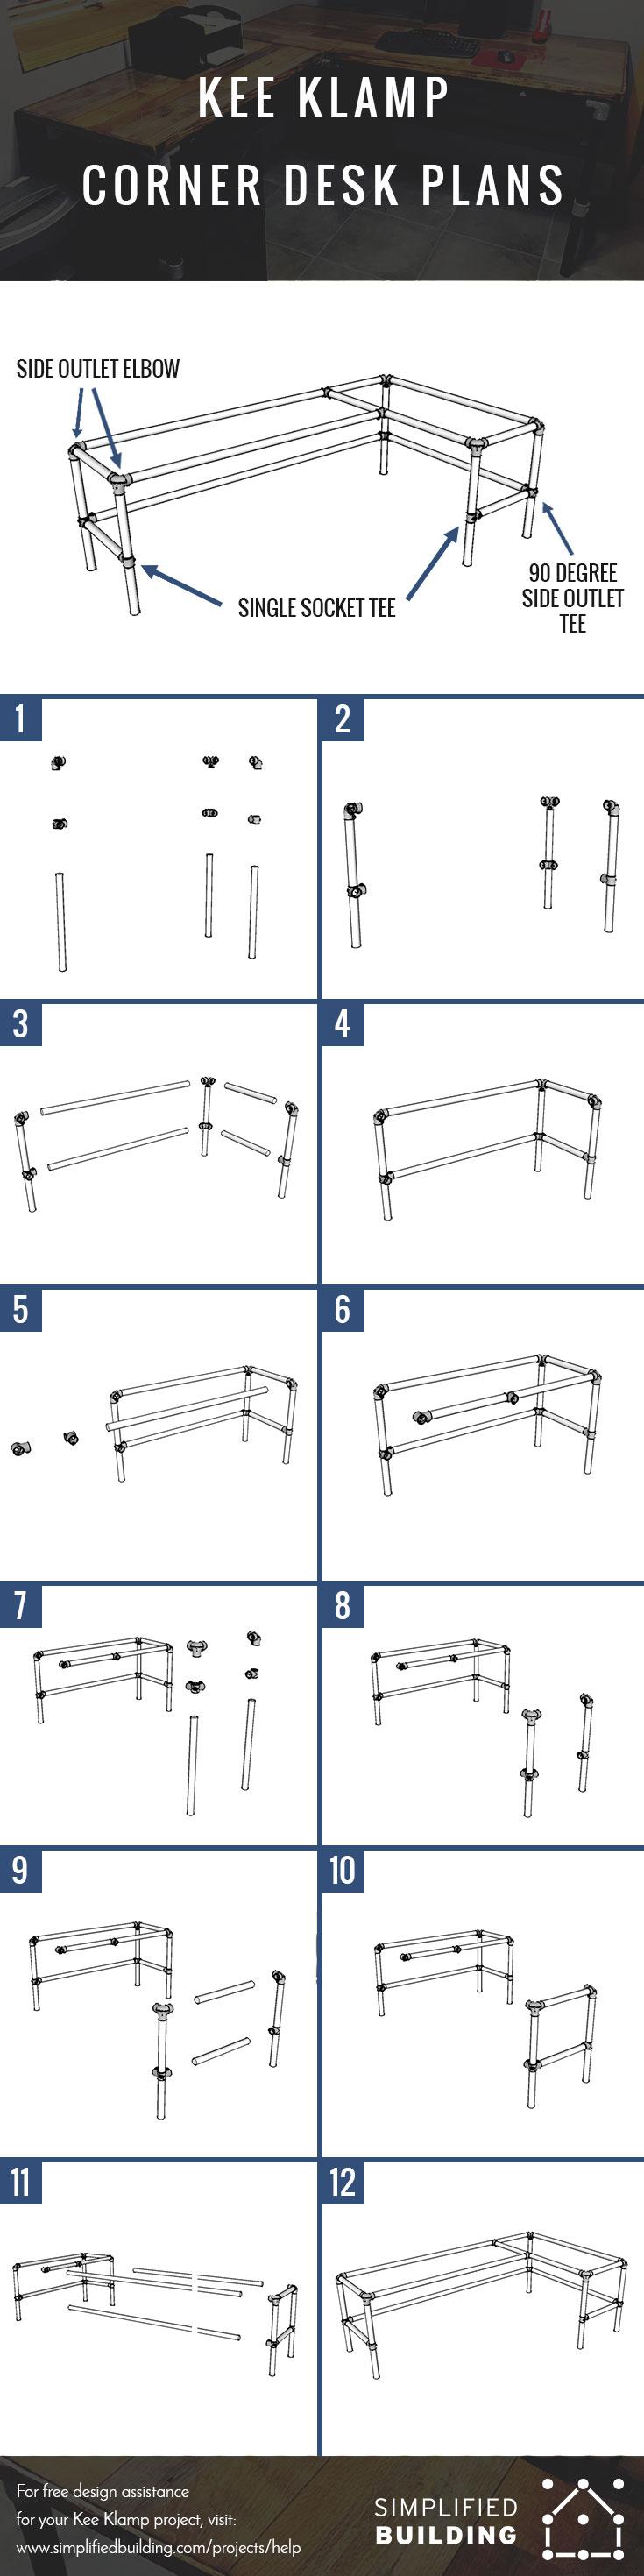 Diy laminate flooring table top desk simplified building - Corner computer desk design plans ...